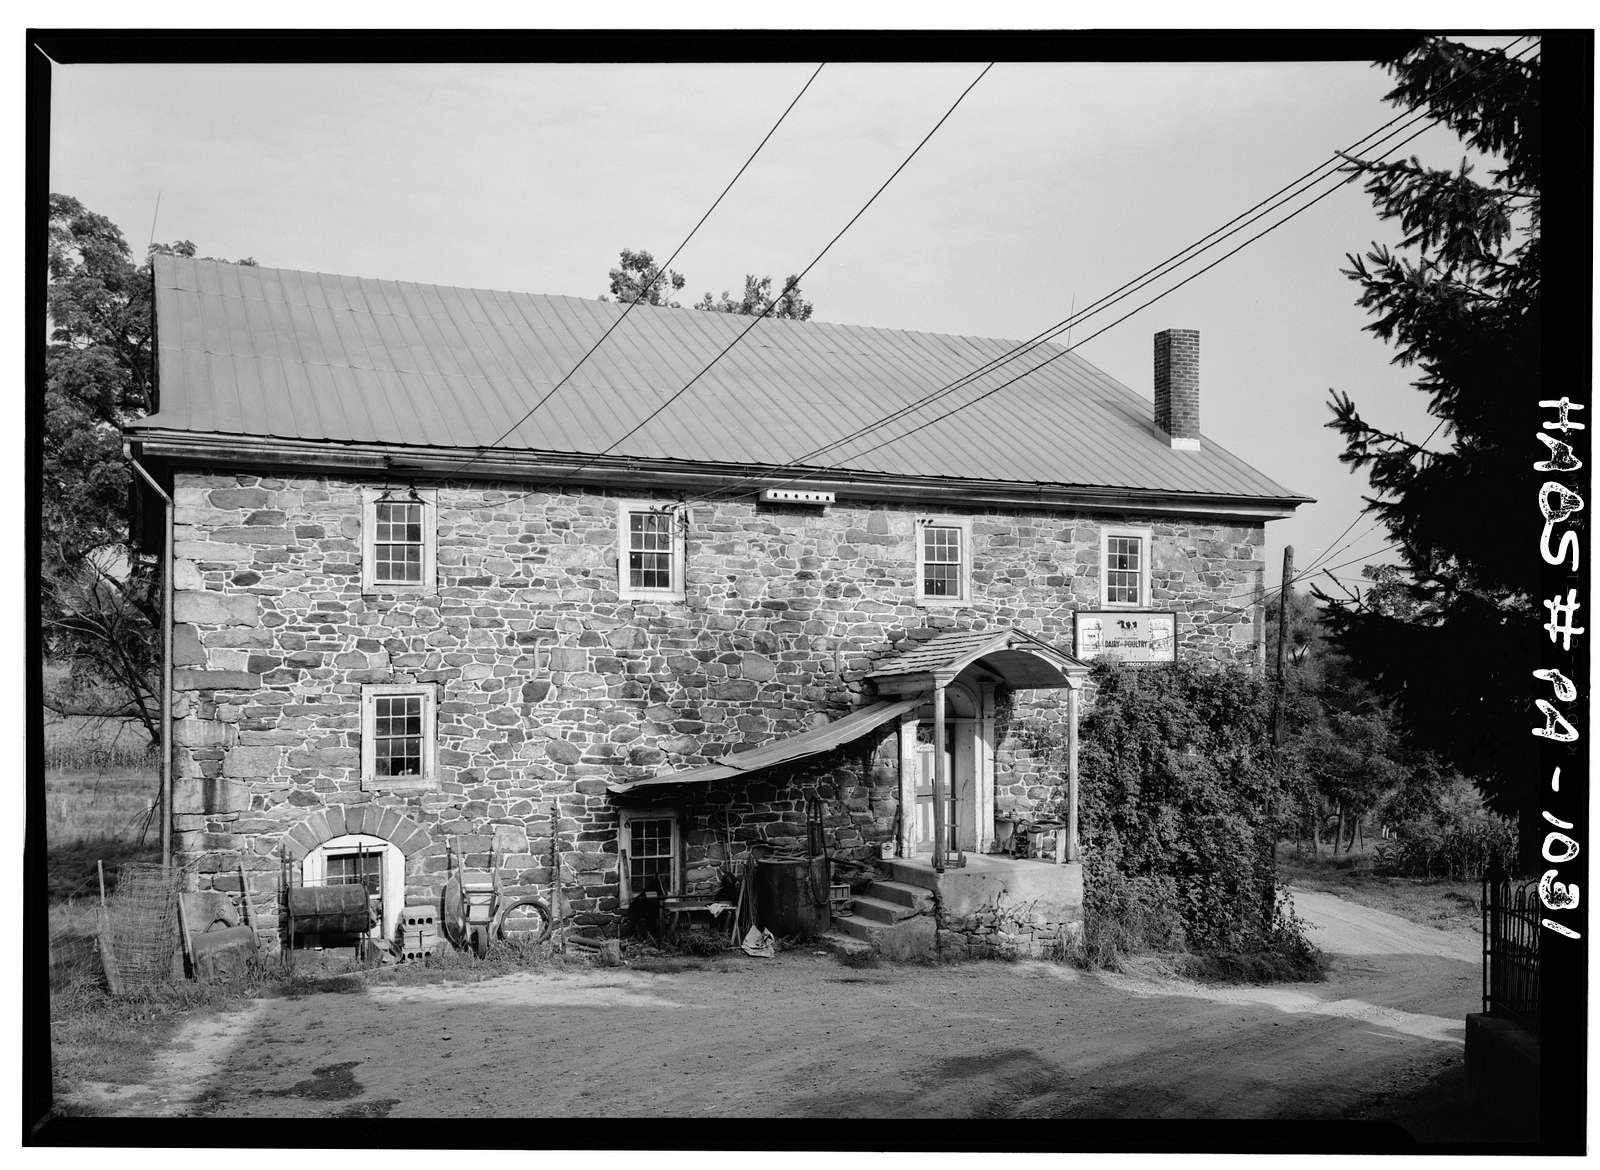 Knabb-Bieber Mill, Monocacy Creek (Oley Township), Oley, Berks County, PA